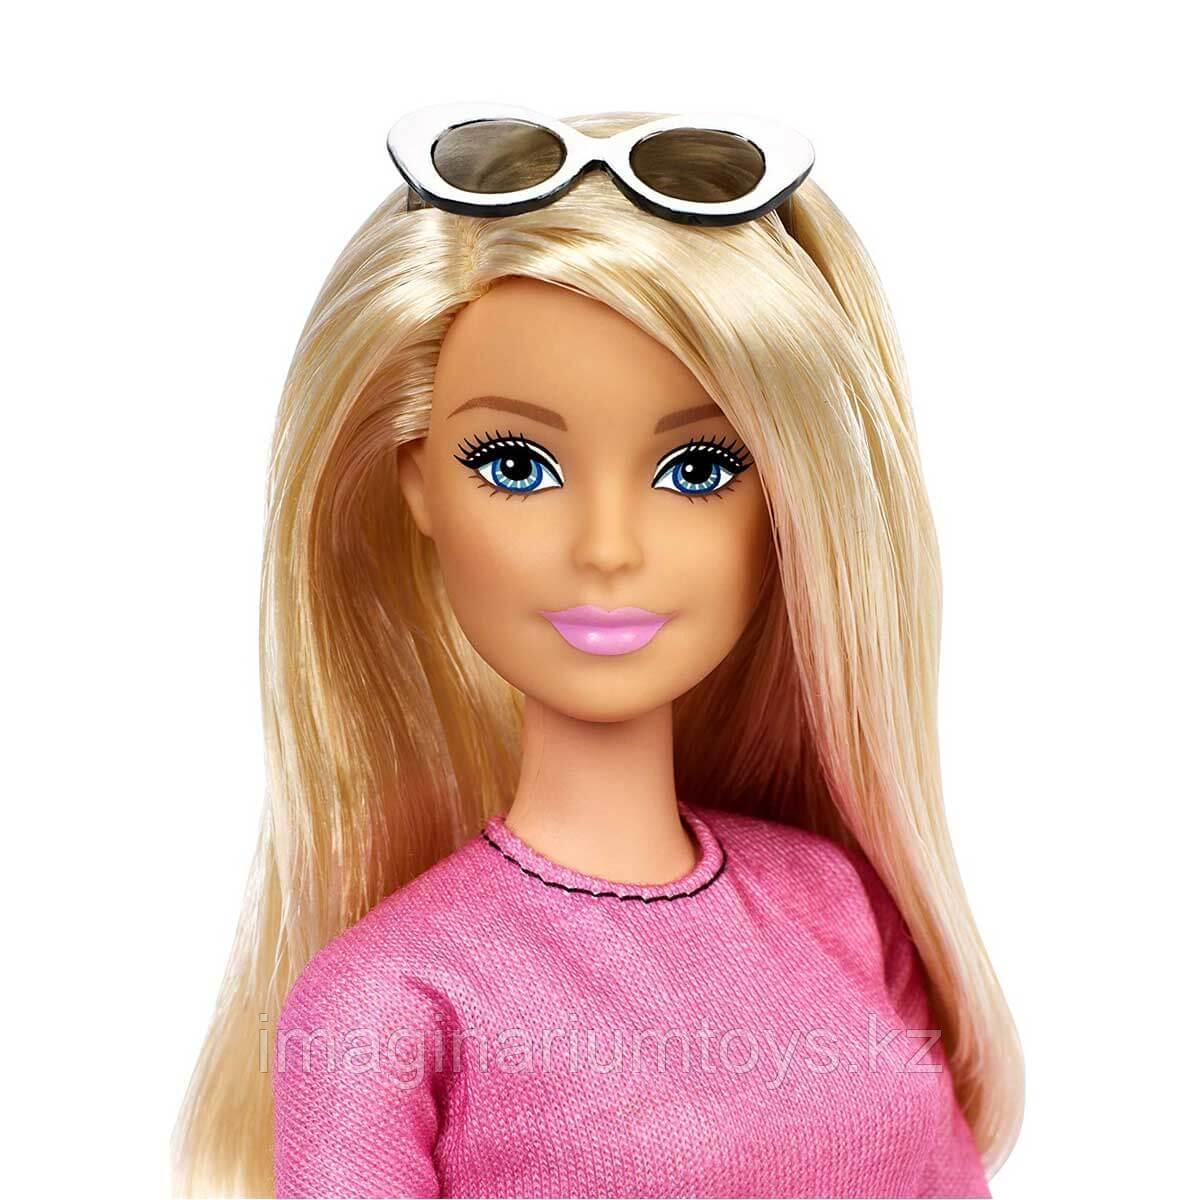 Кукла Барби модница #104 - фото 2